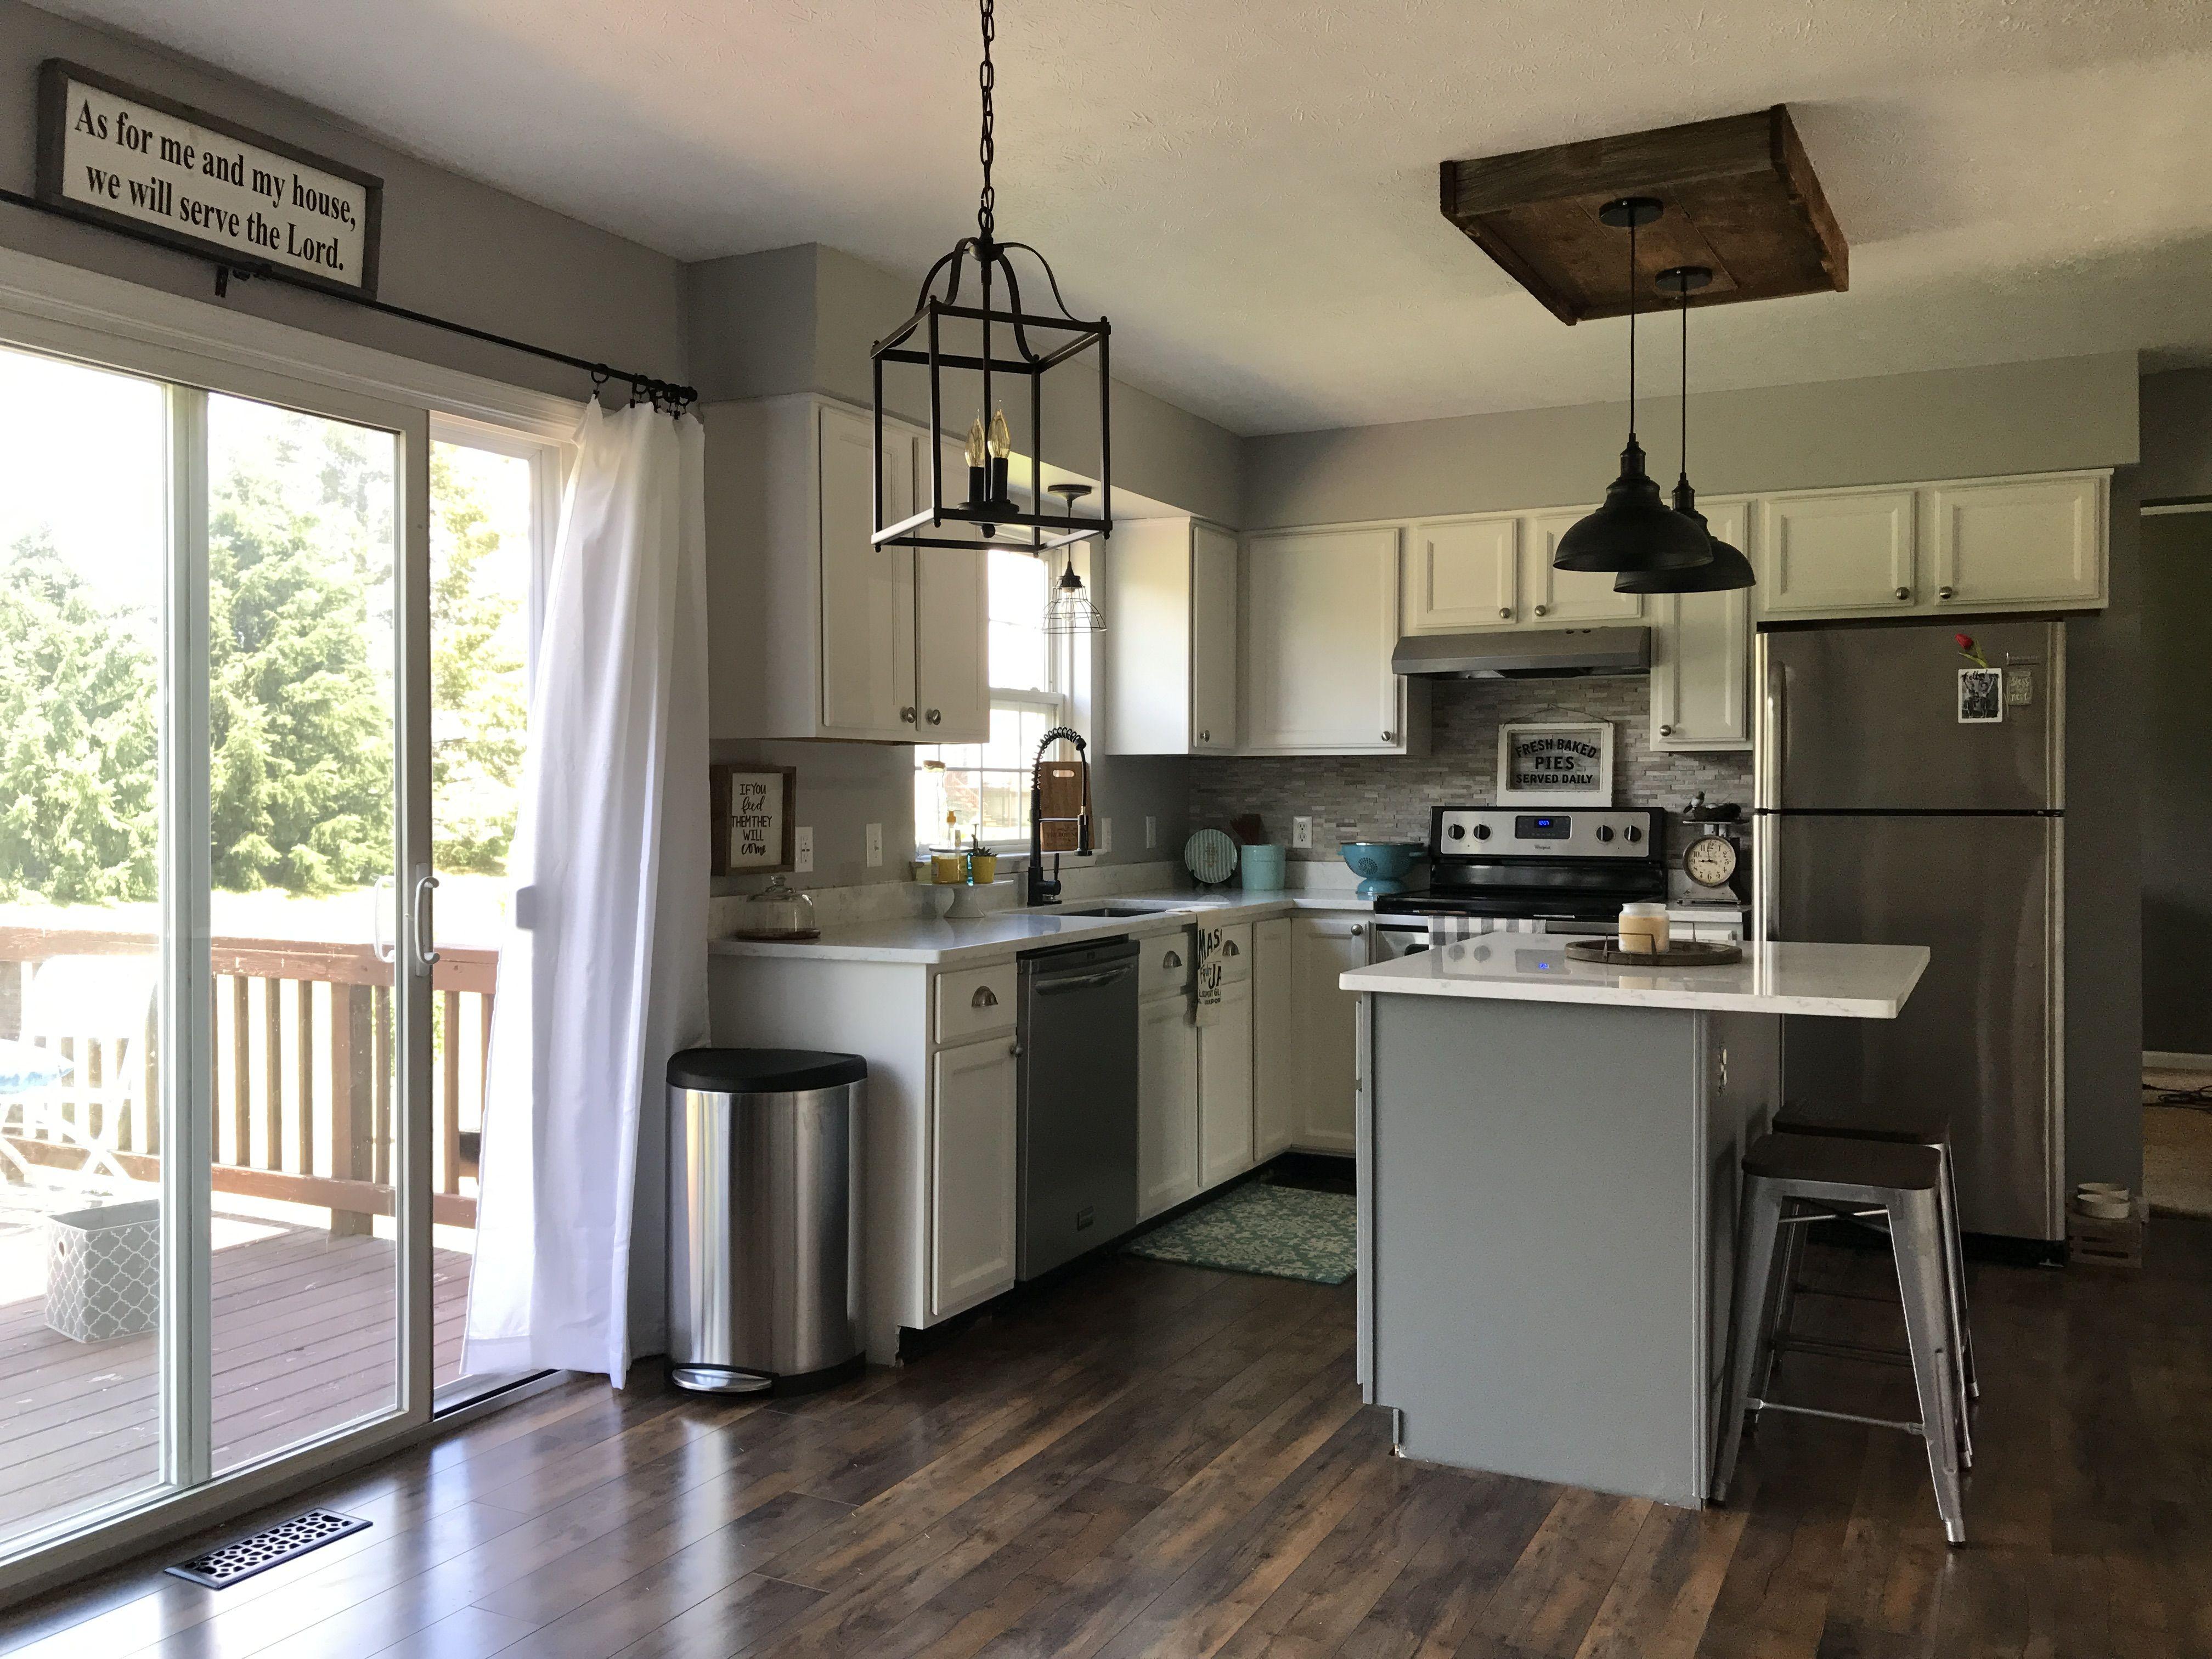 White and grey kitchen, farmhouse style Snowbound by